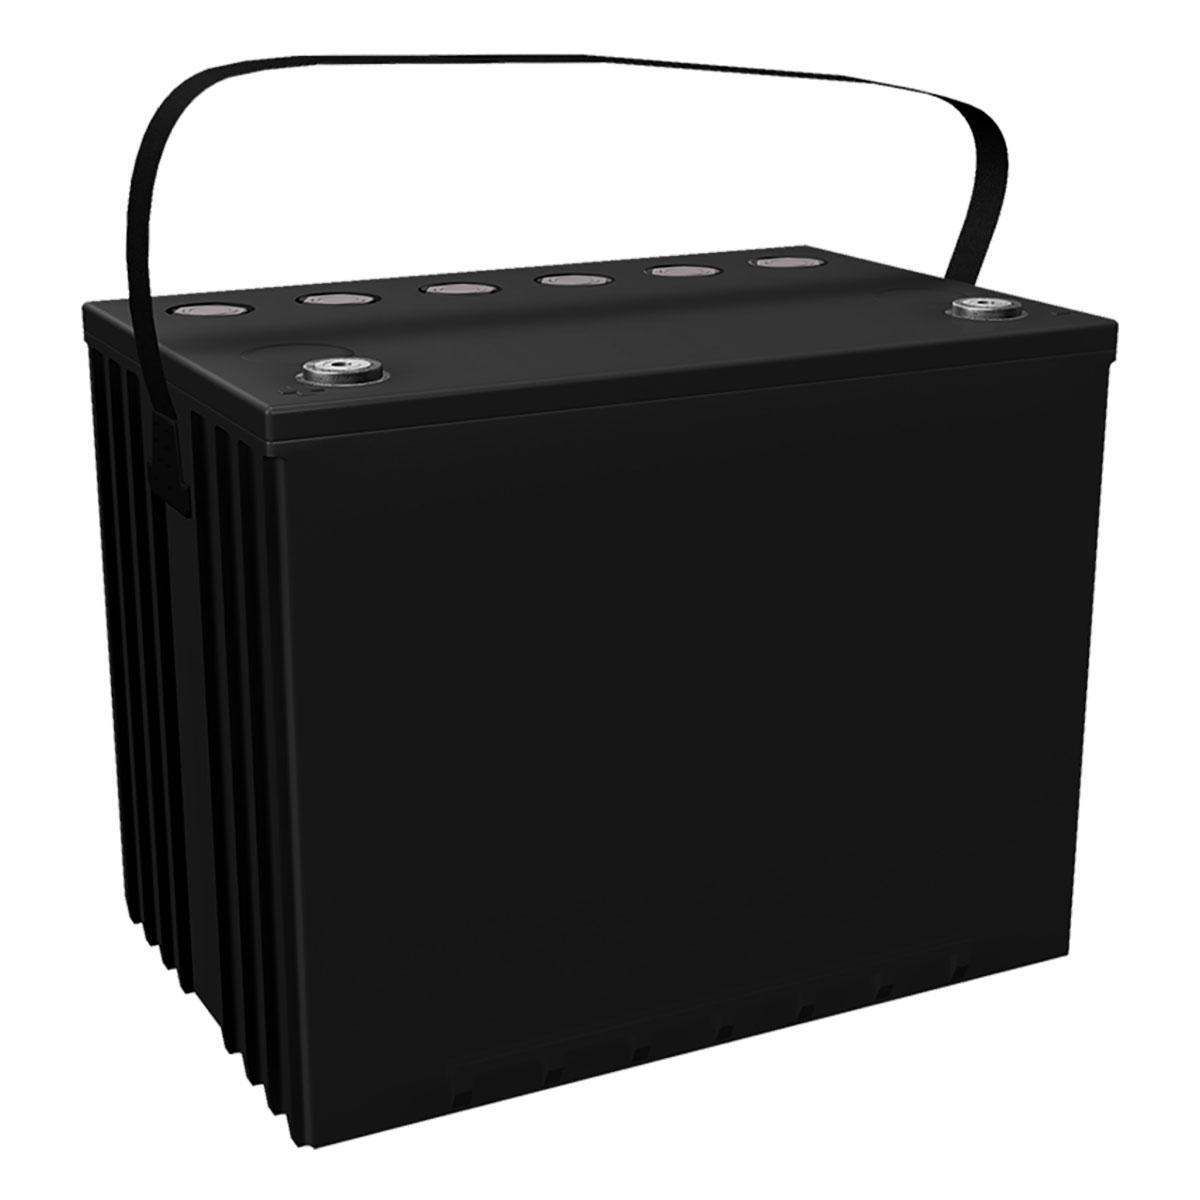 https://www.mujbob.cz/produkty_fotogalerie/gelova-baterie-pro-podlahovy-myci-stroj-bohman-1-b-35-bohman-b-11566751650L.jpg